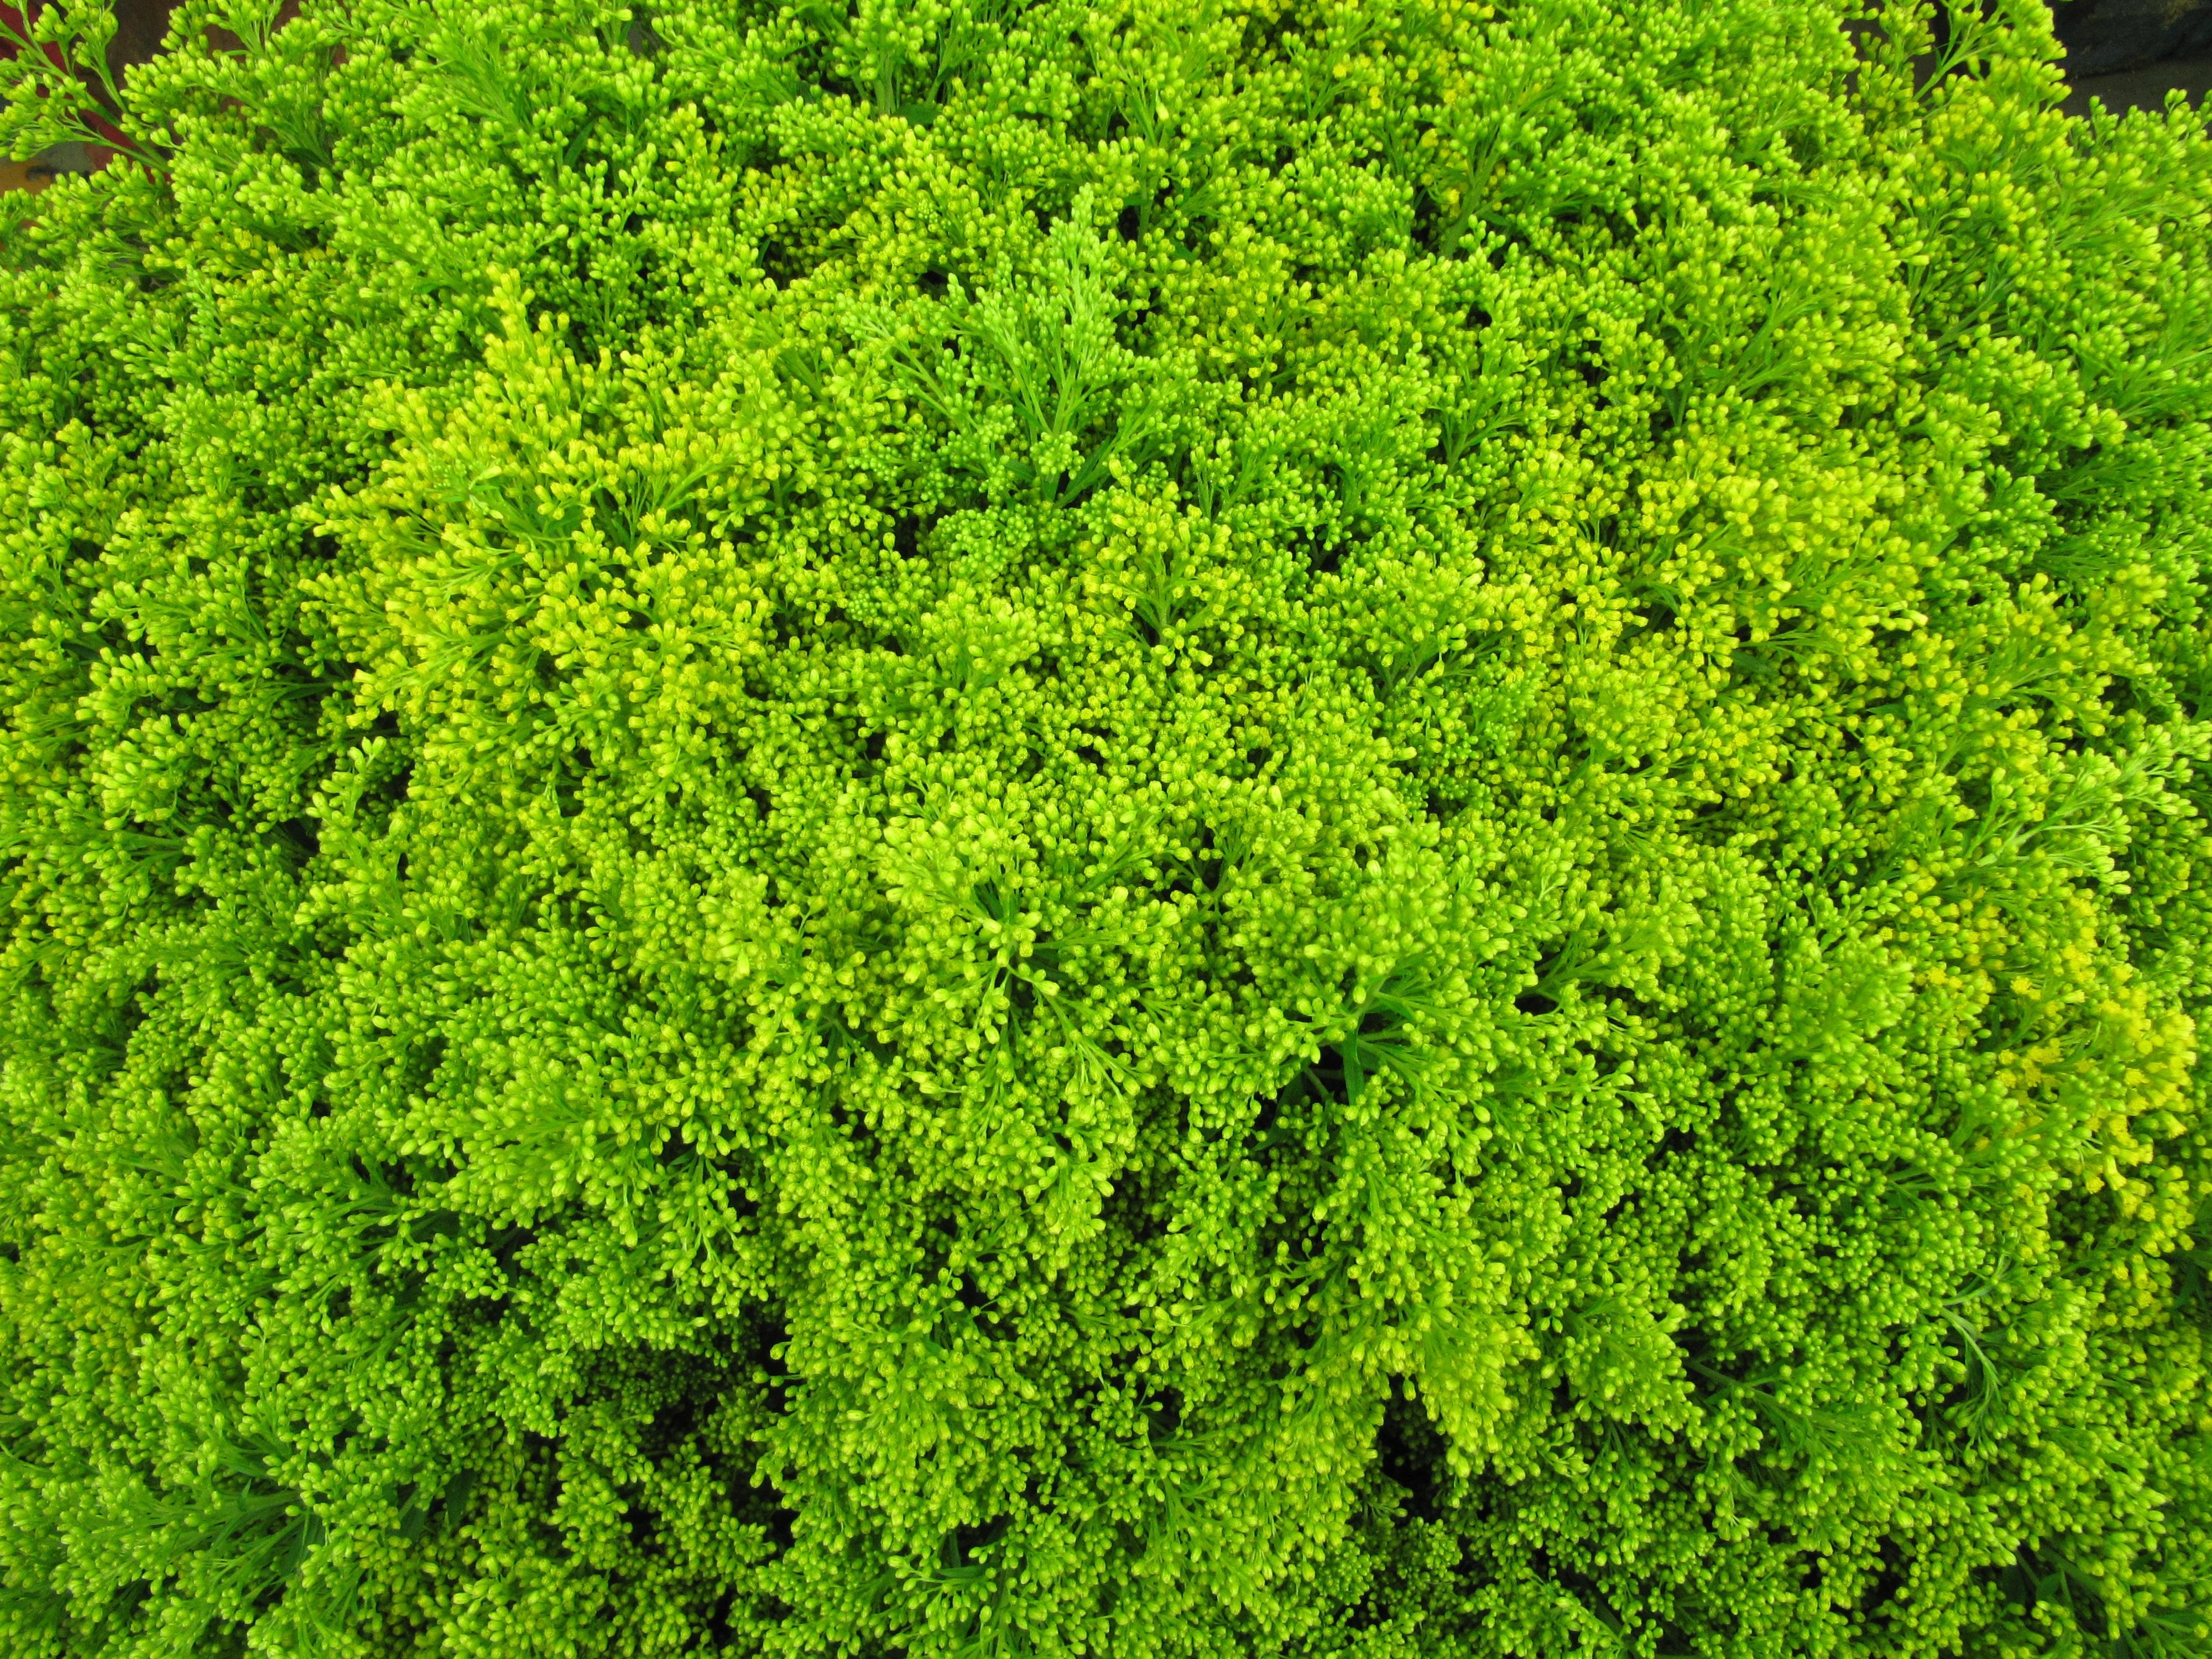 Fotos gratis rbol c sped hoja flor musgo floral for Vegetacion ornamental